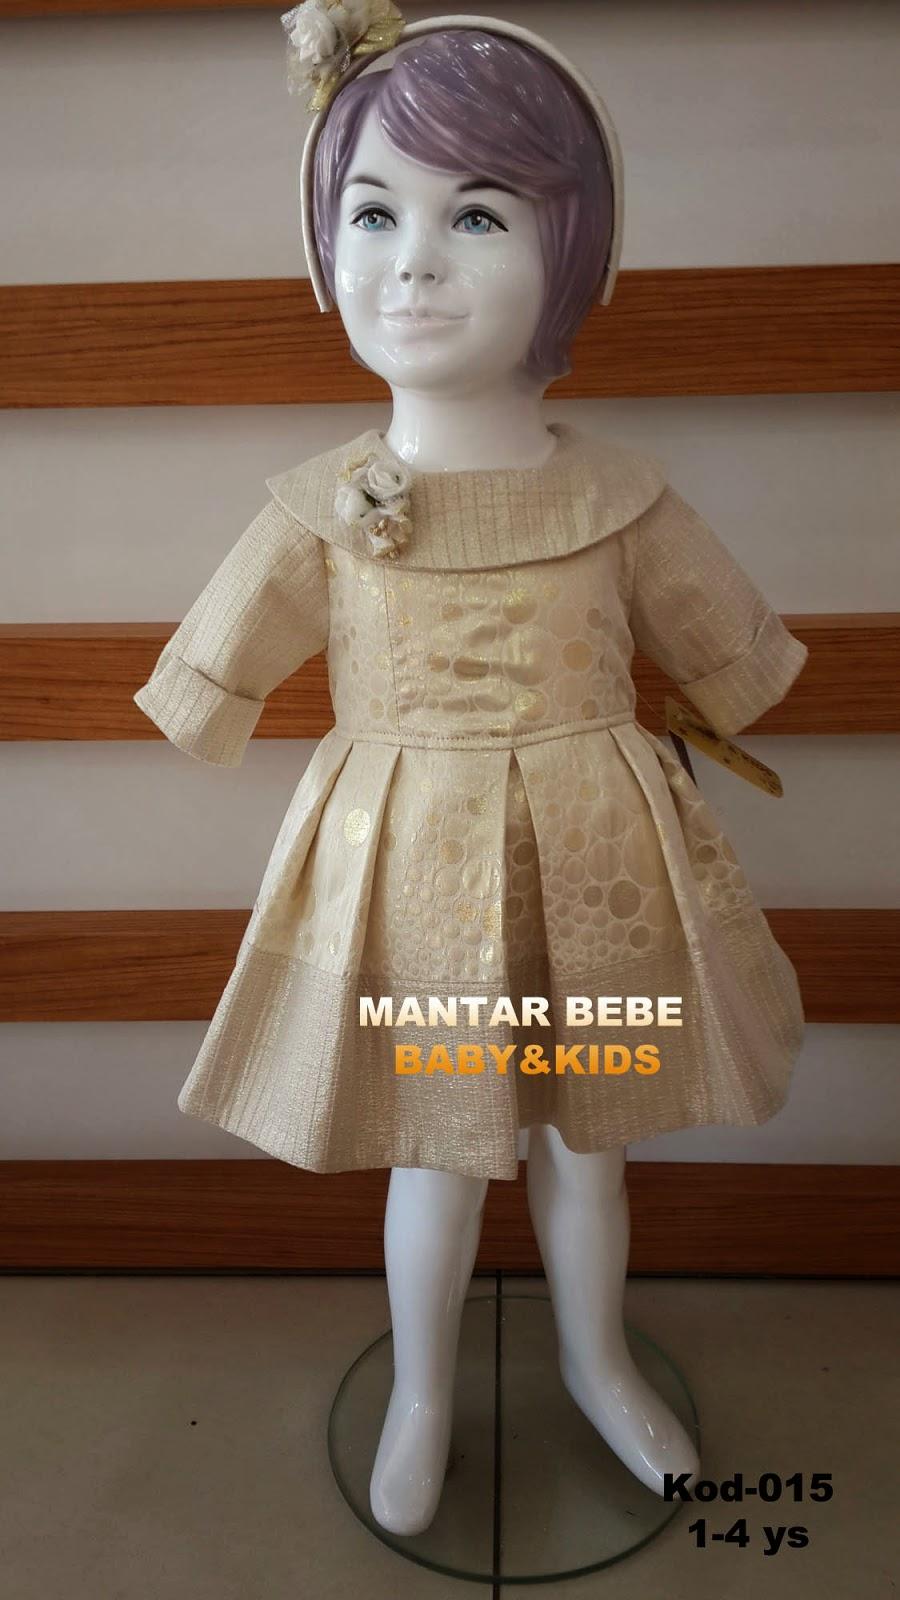 MANTAR BEBE ÇOCUK GİYİM - KOD015